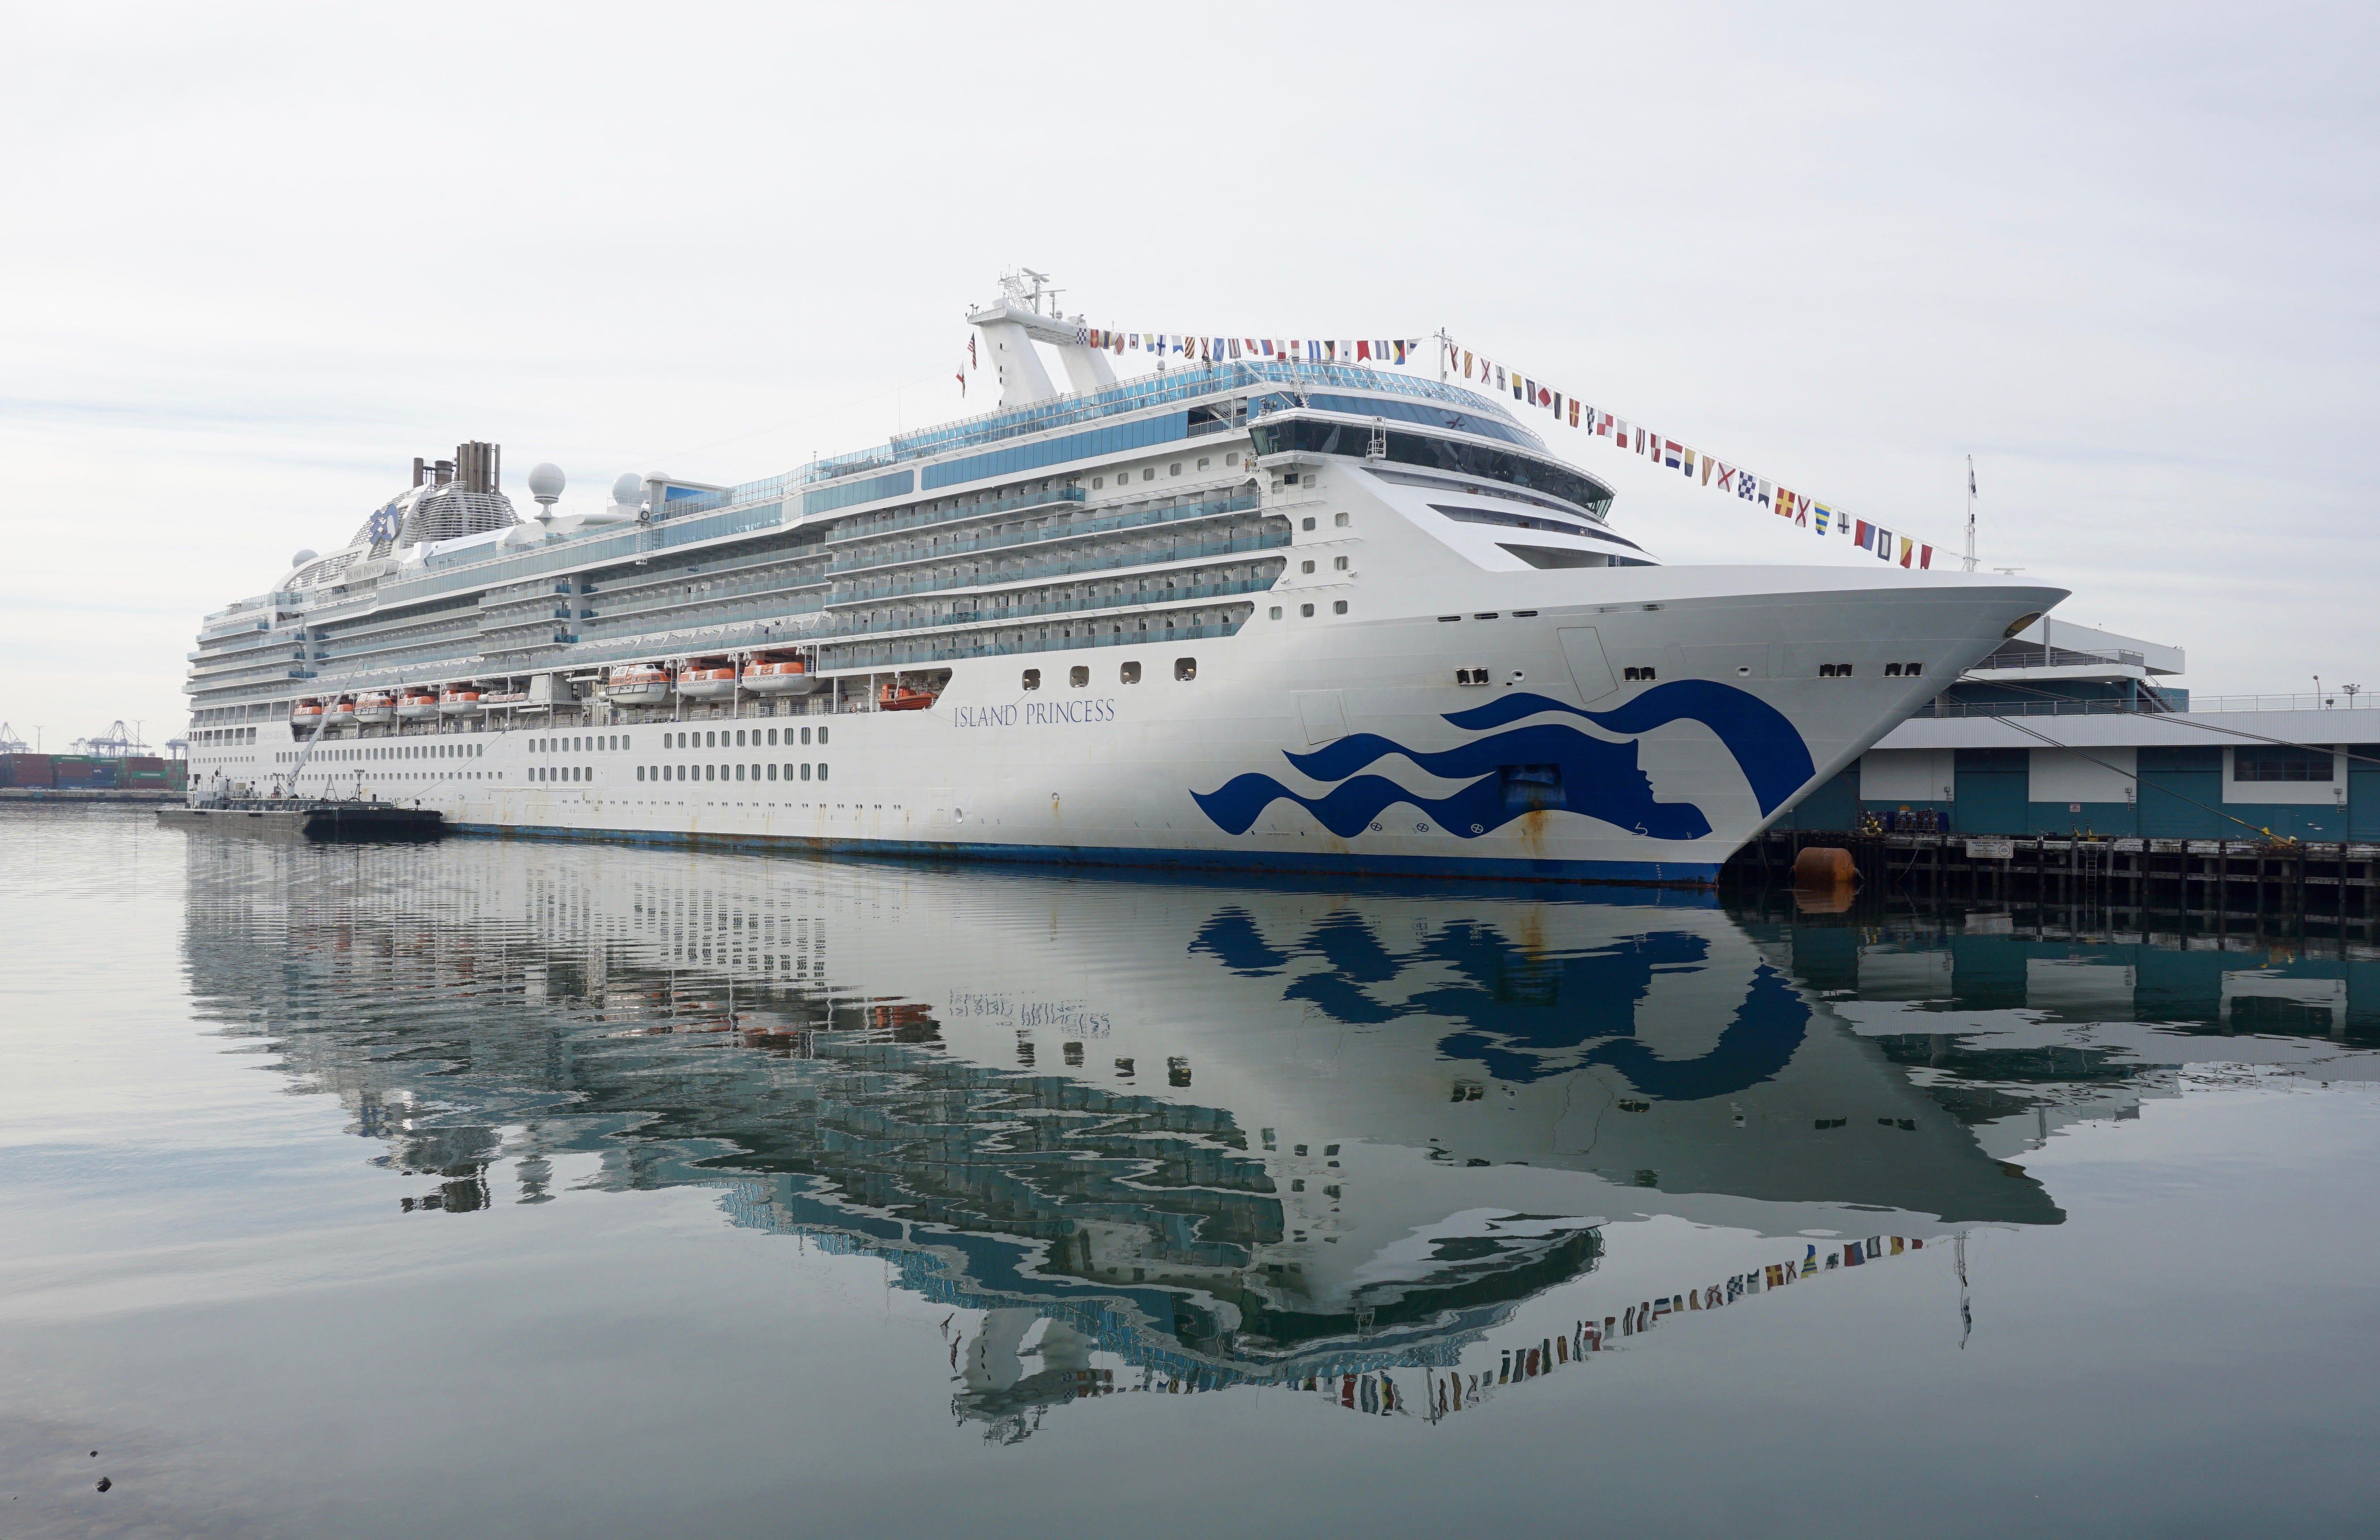 Cruise ship tours: Take a look inside Princess Cruises' Island Princess